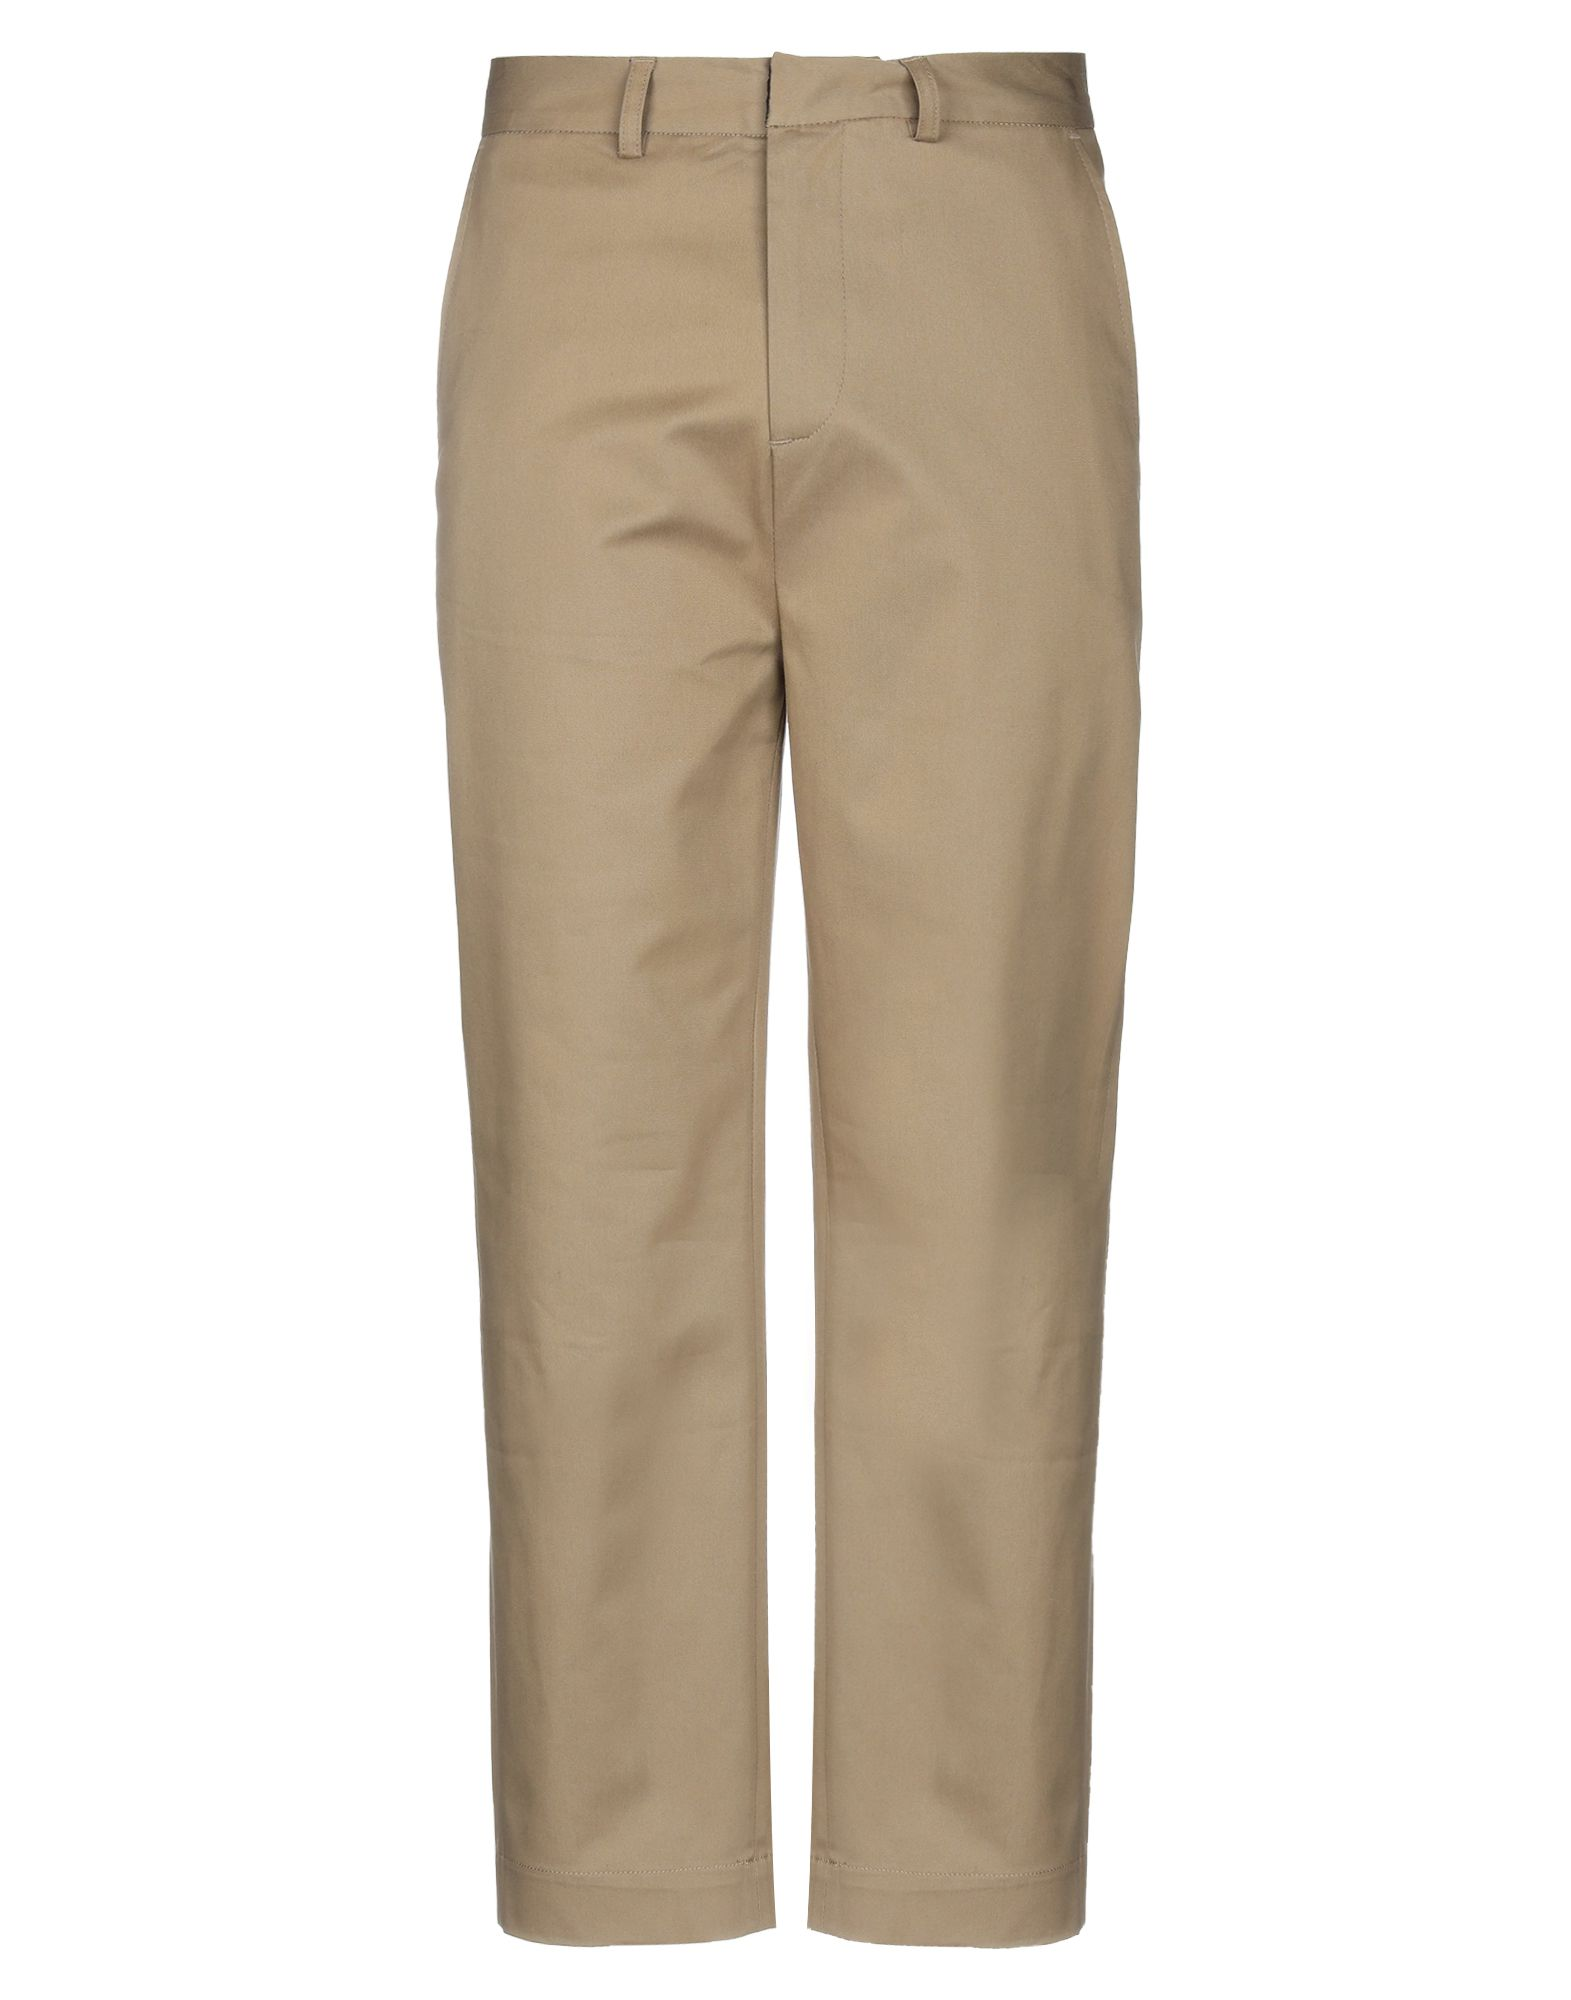 LIBERTINE-LIBERTINE Повседневные брюки